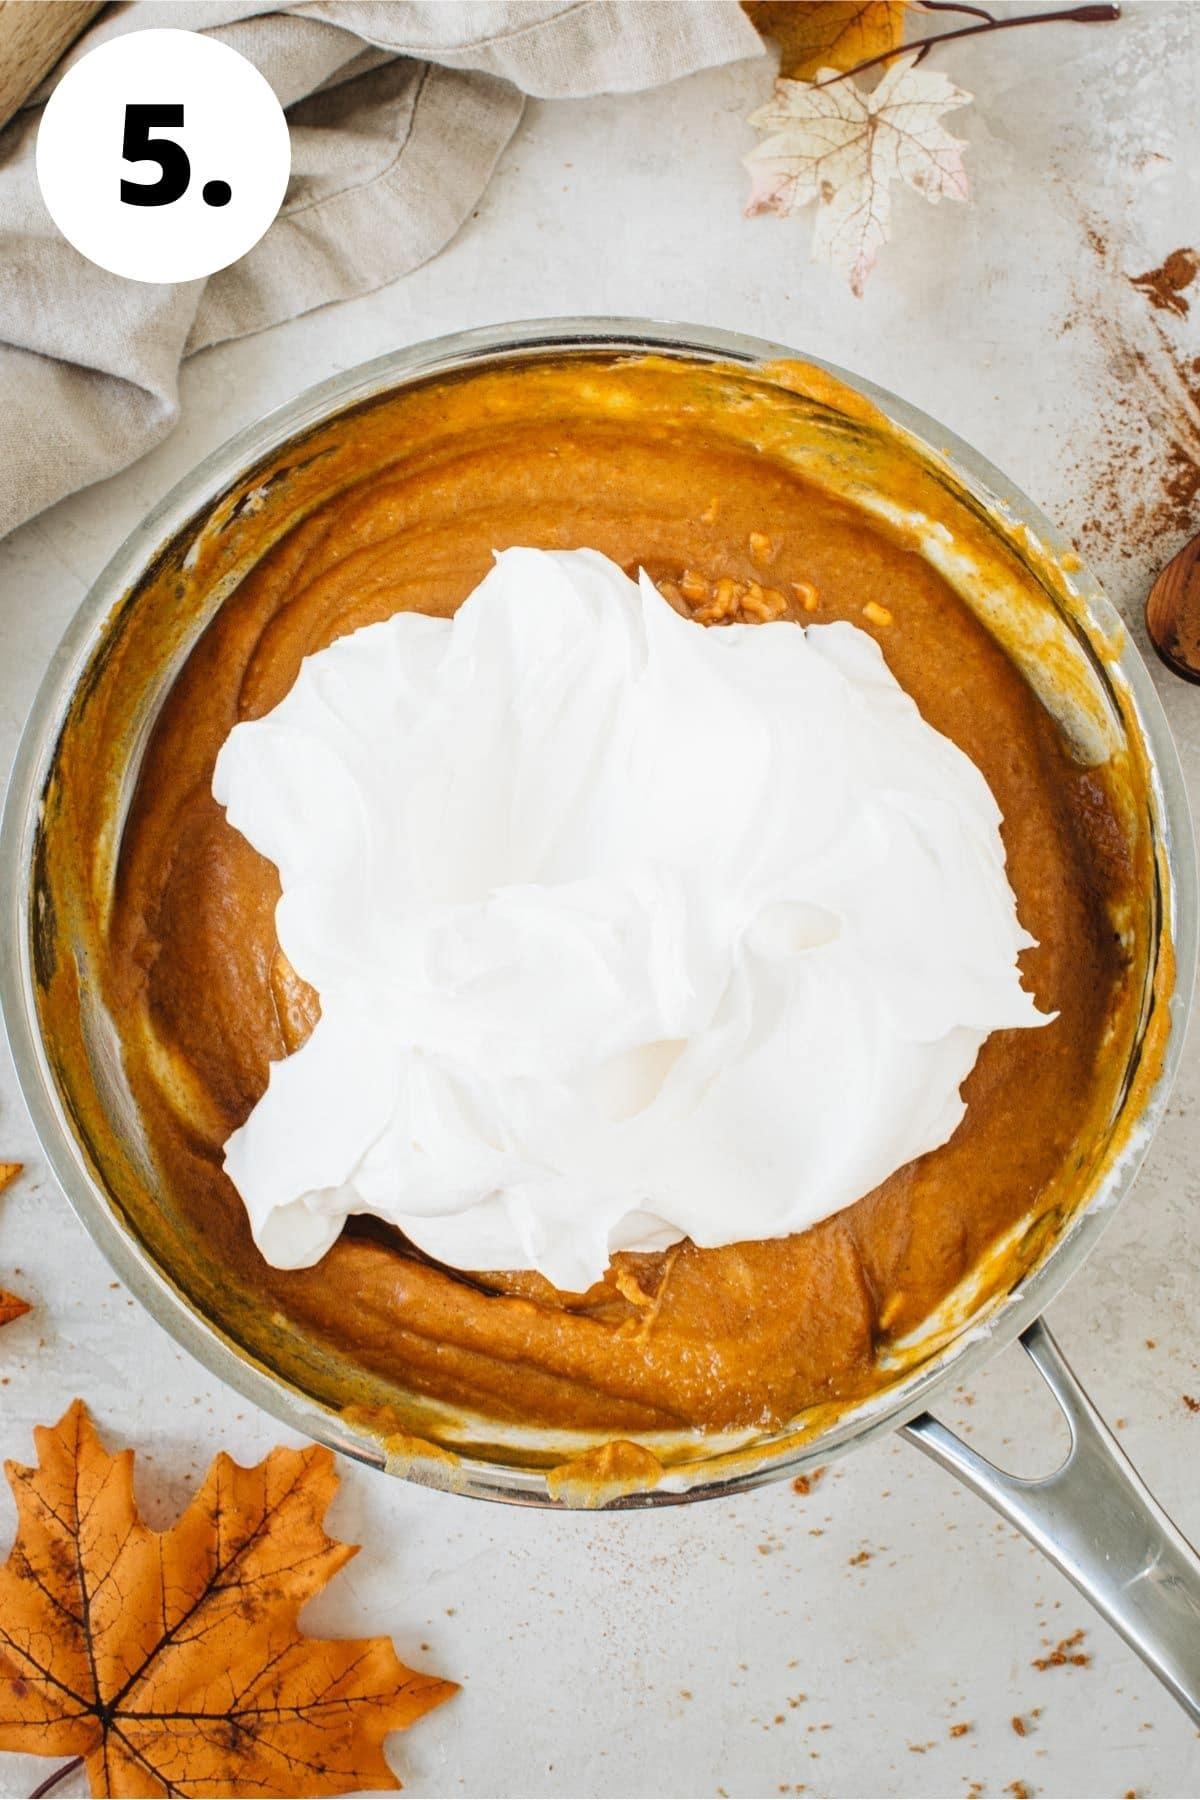 No-bake pumpkin pie process step 5.